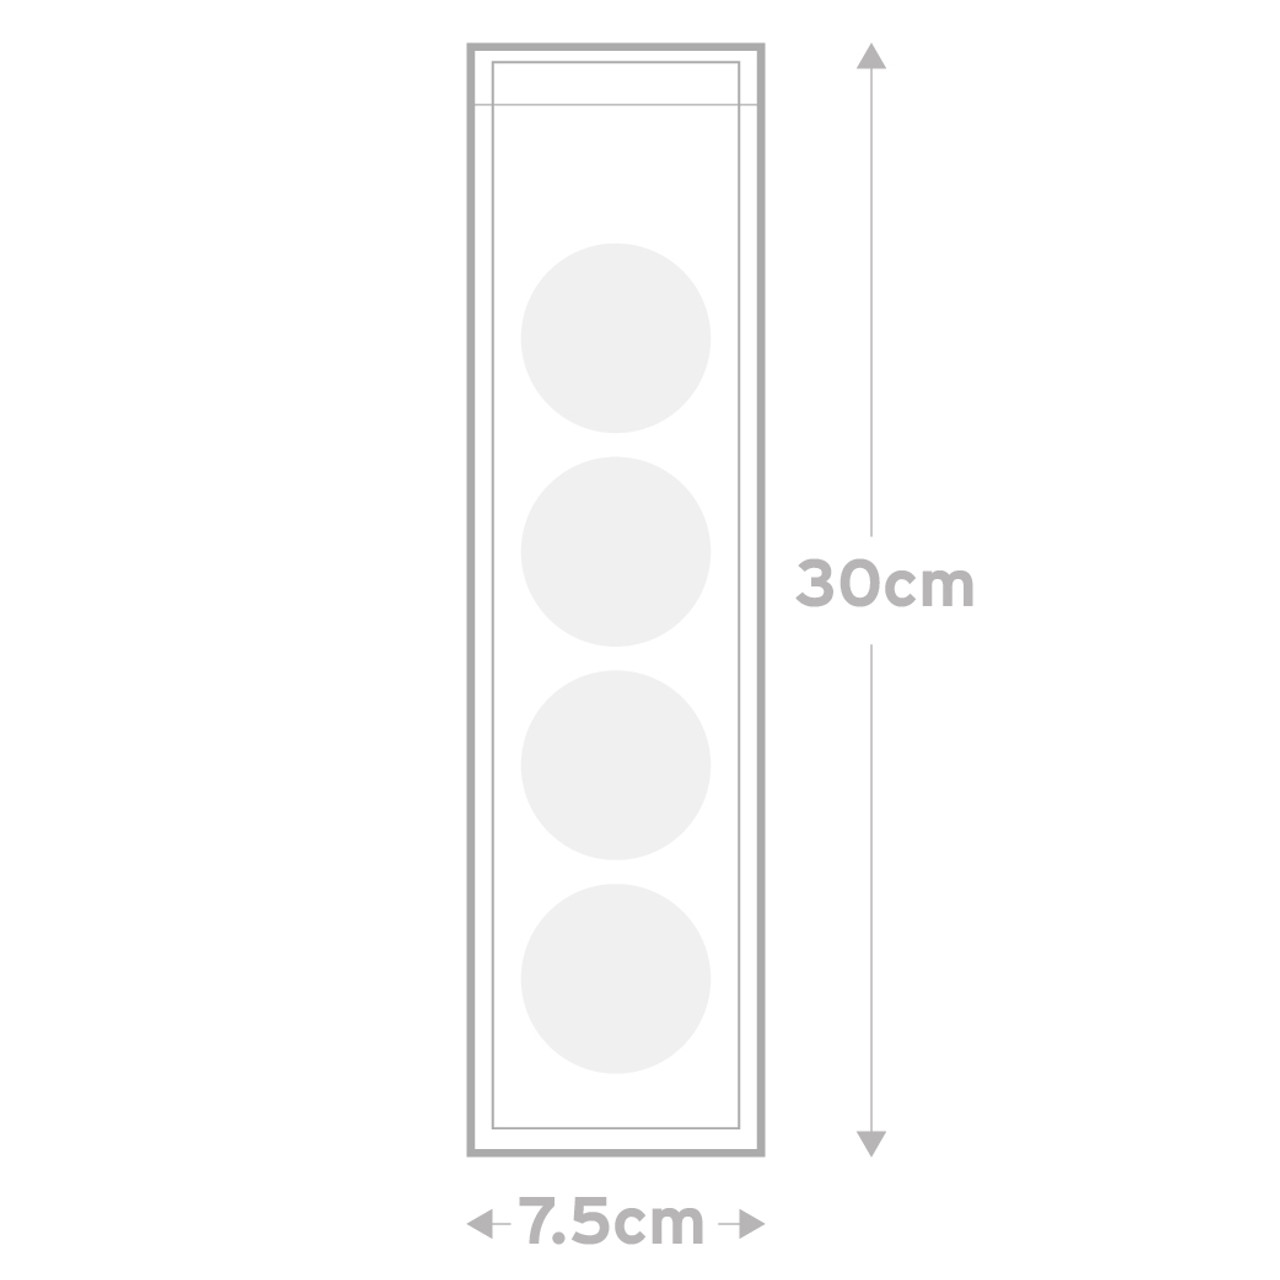 Peel & Seal Bags  Pkt 30  -   7.5  x  30.0 cms